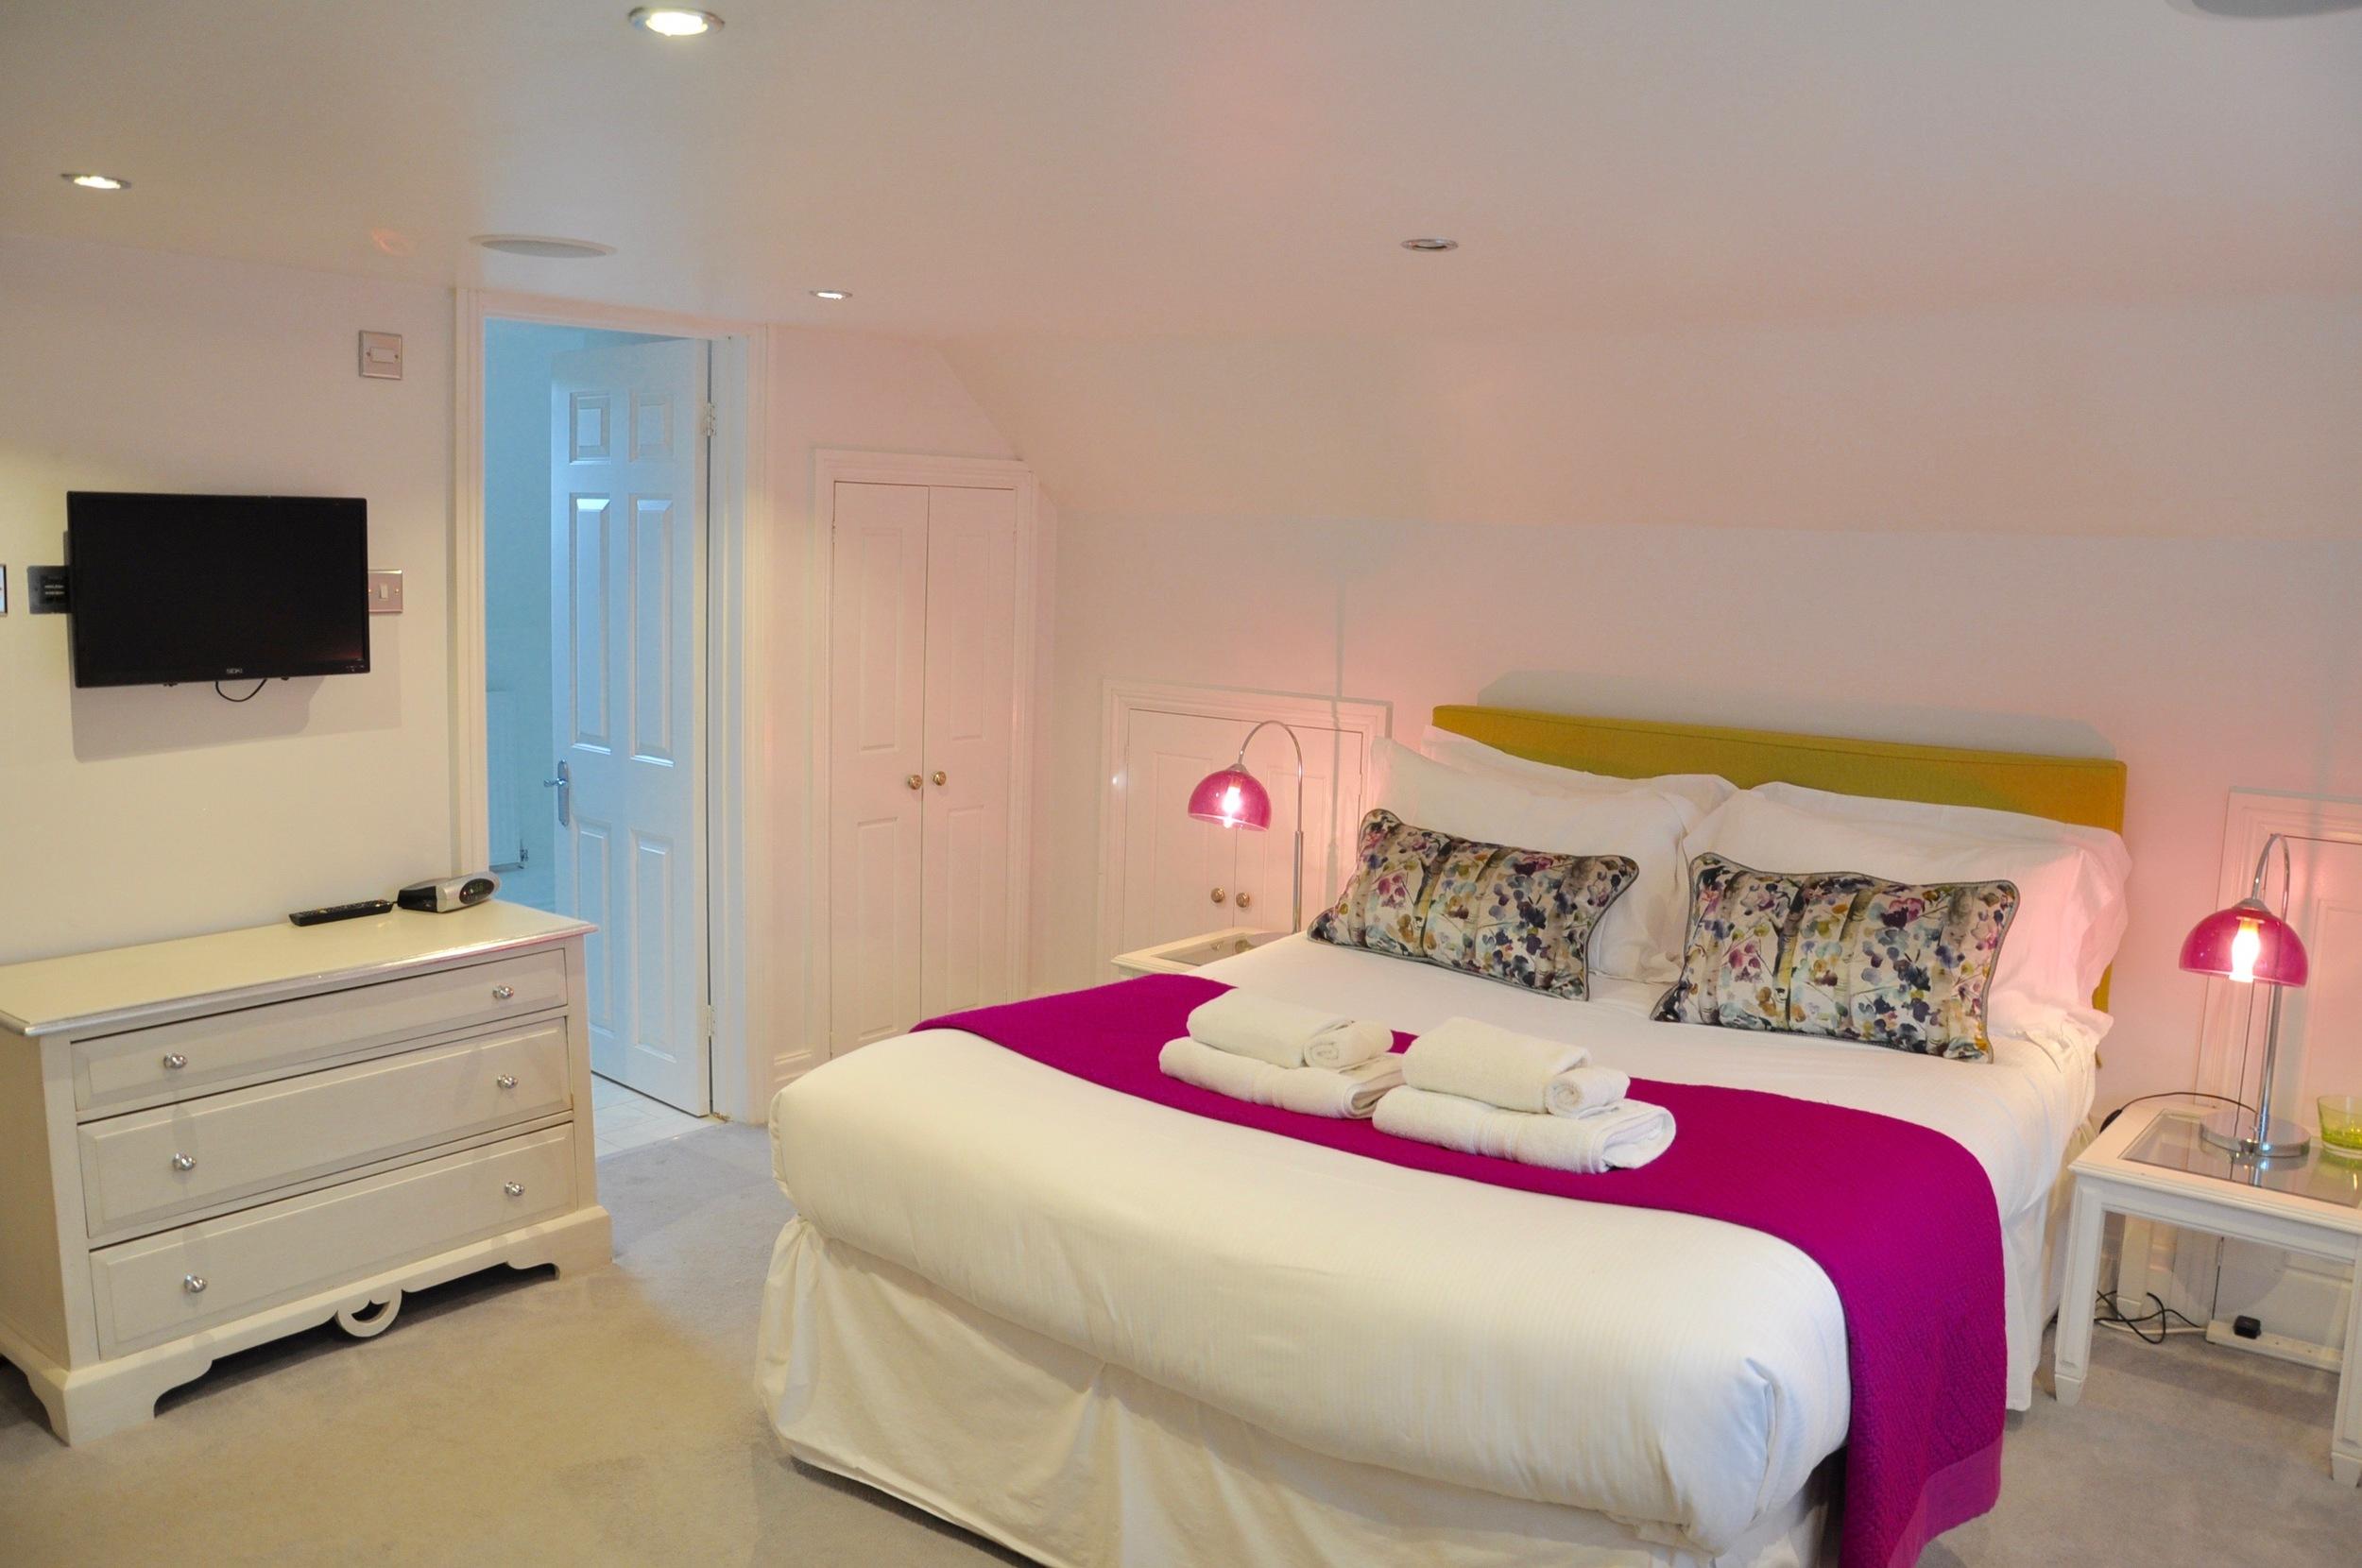 Ensuite bedroom, Bedroom 2